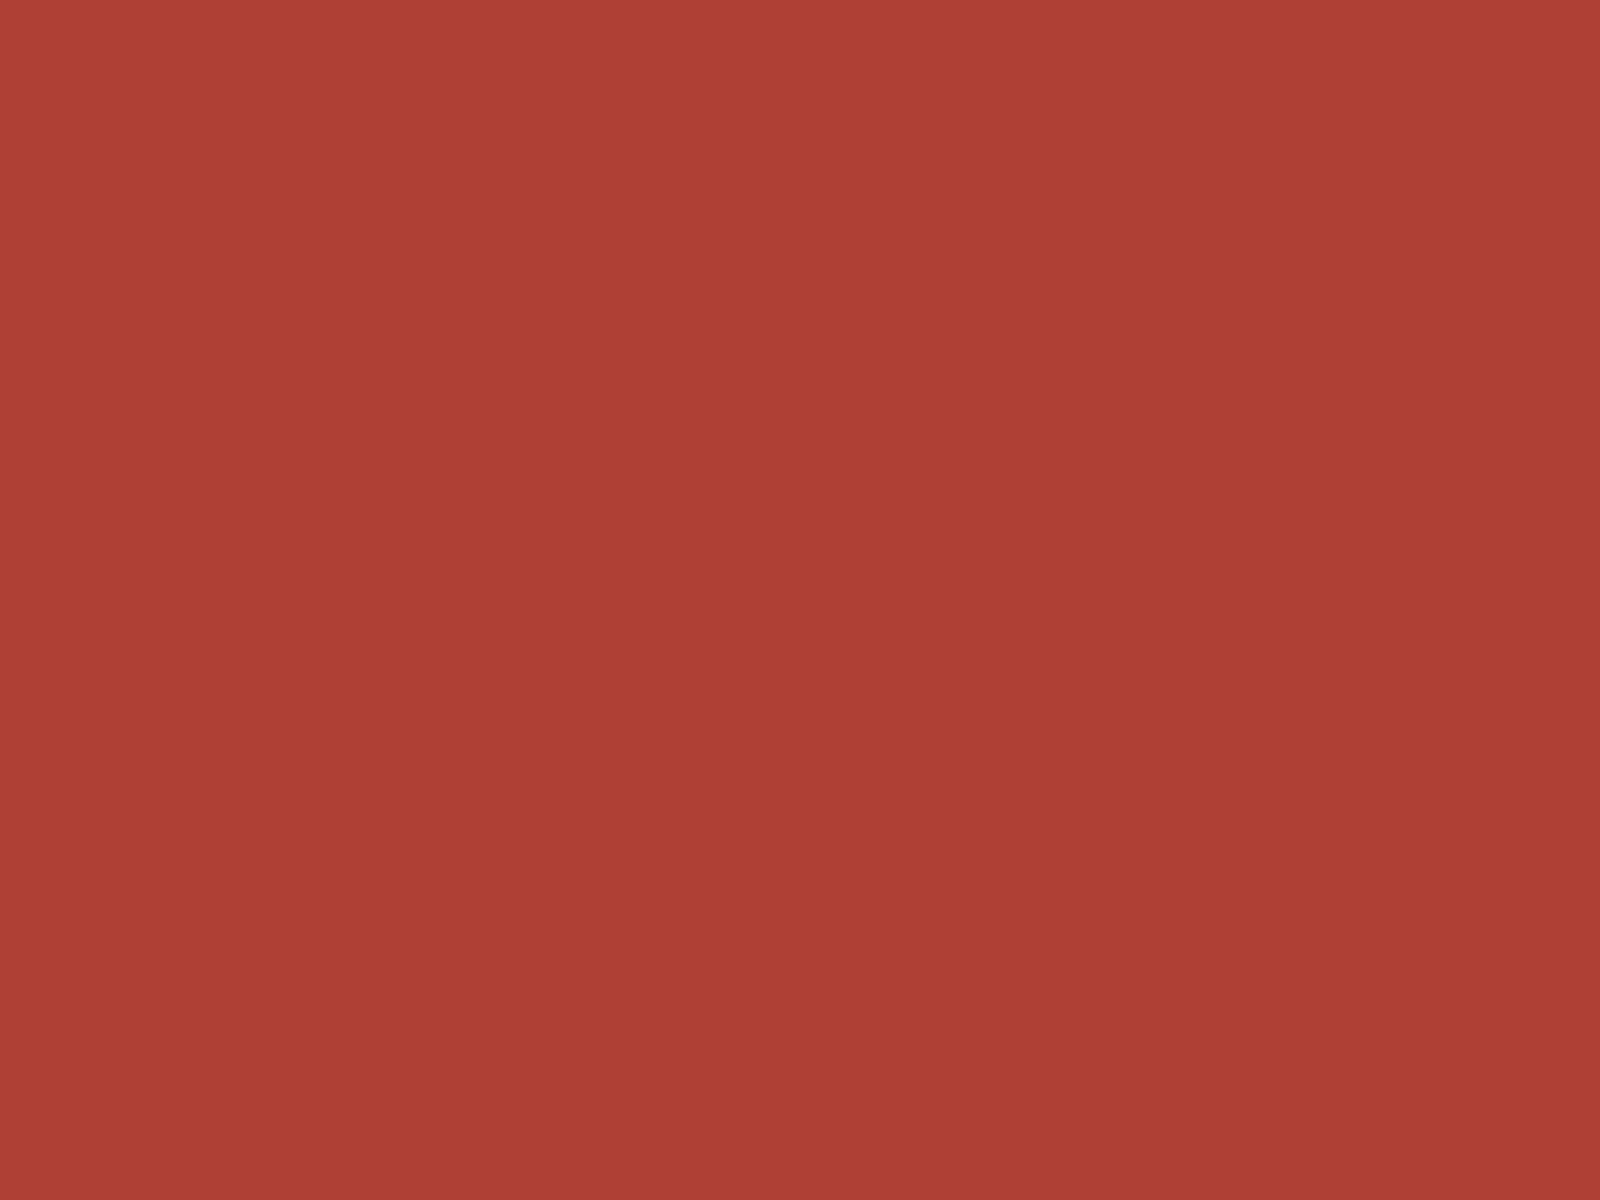 1600x1200 Pale Carmine Solid Color Background